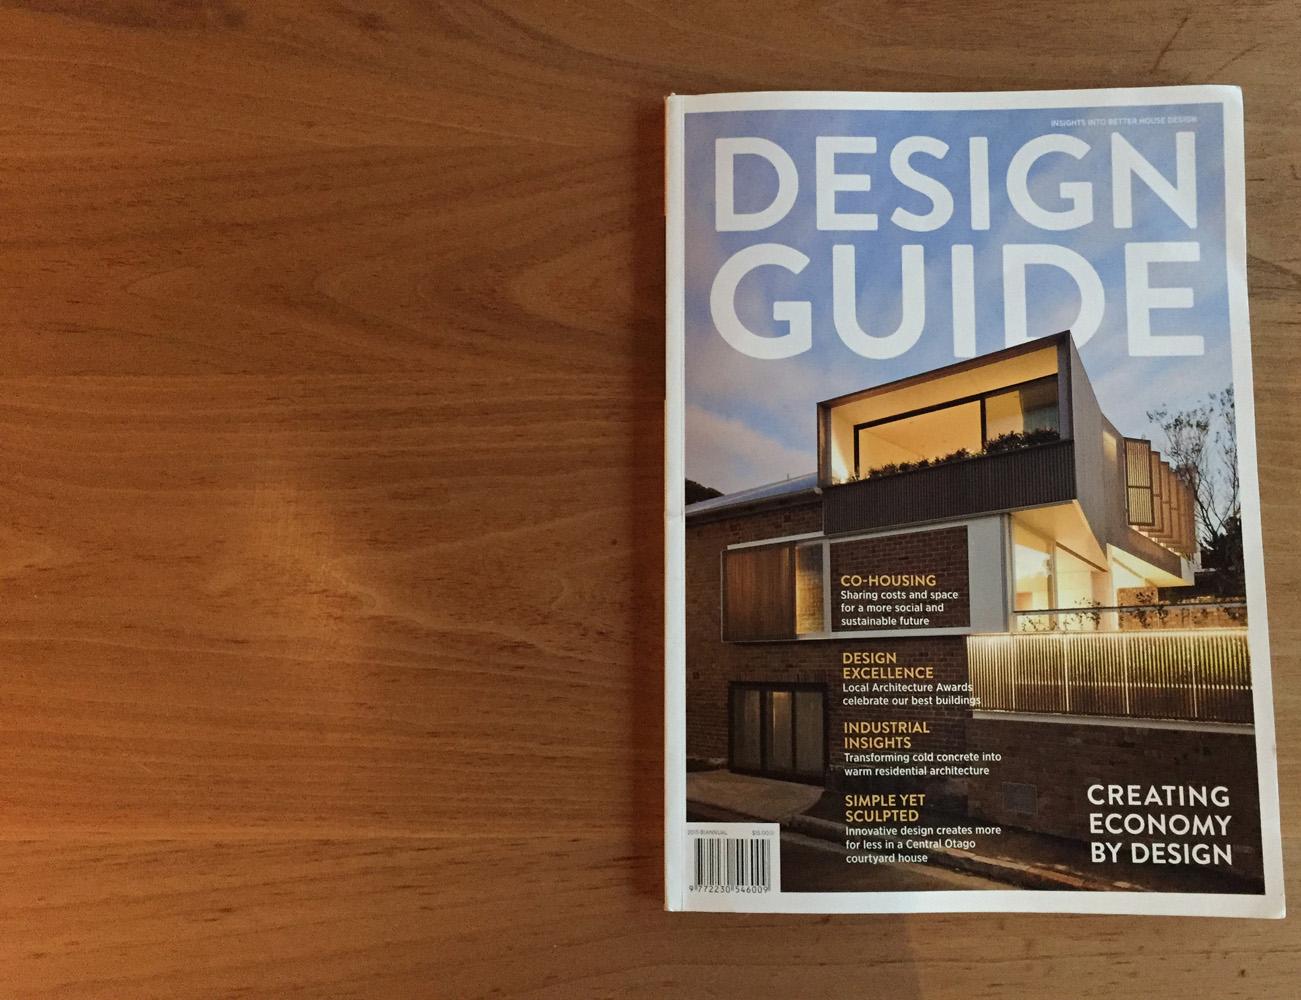 Design Guide New Zealand Australia Malboeuf Bowie Architecture